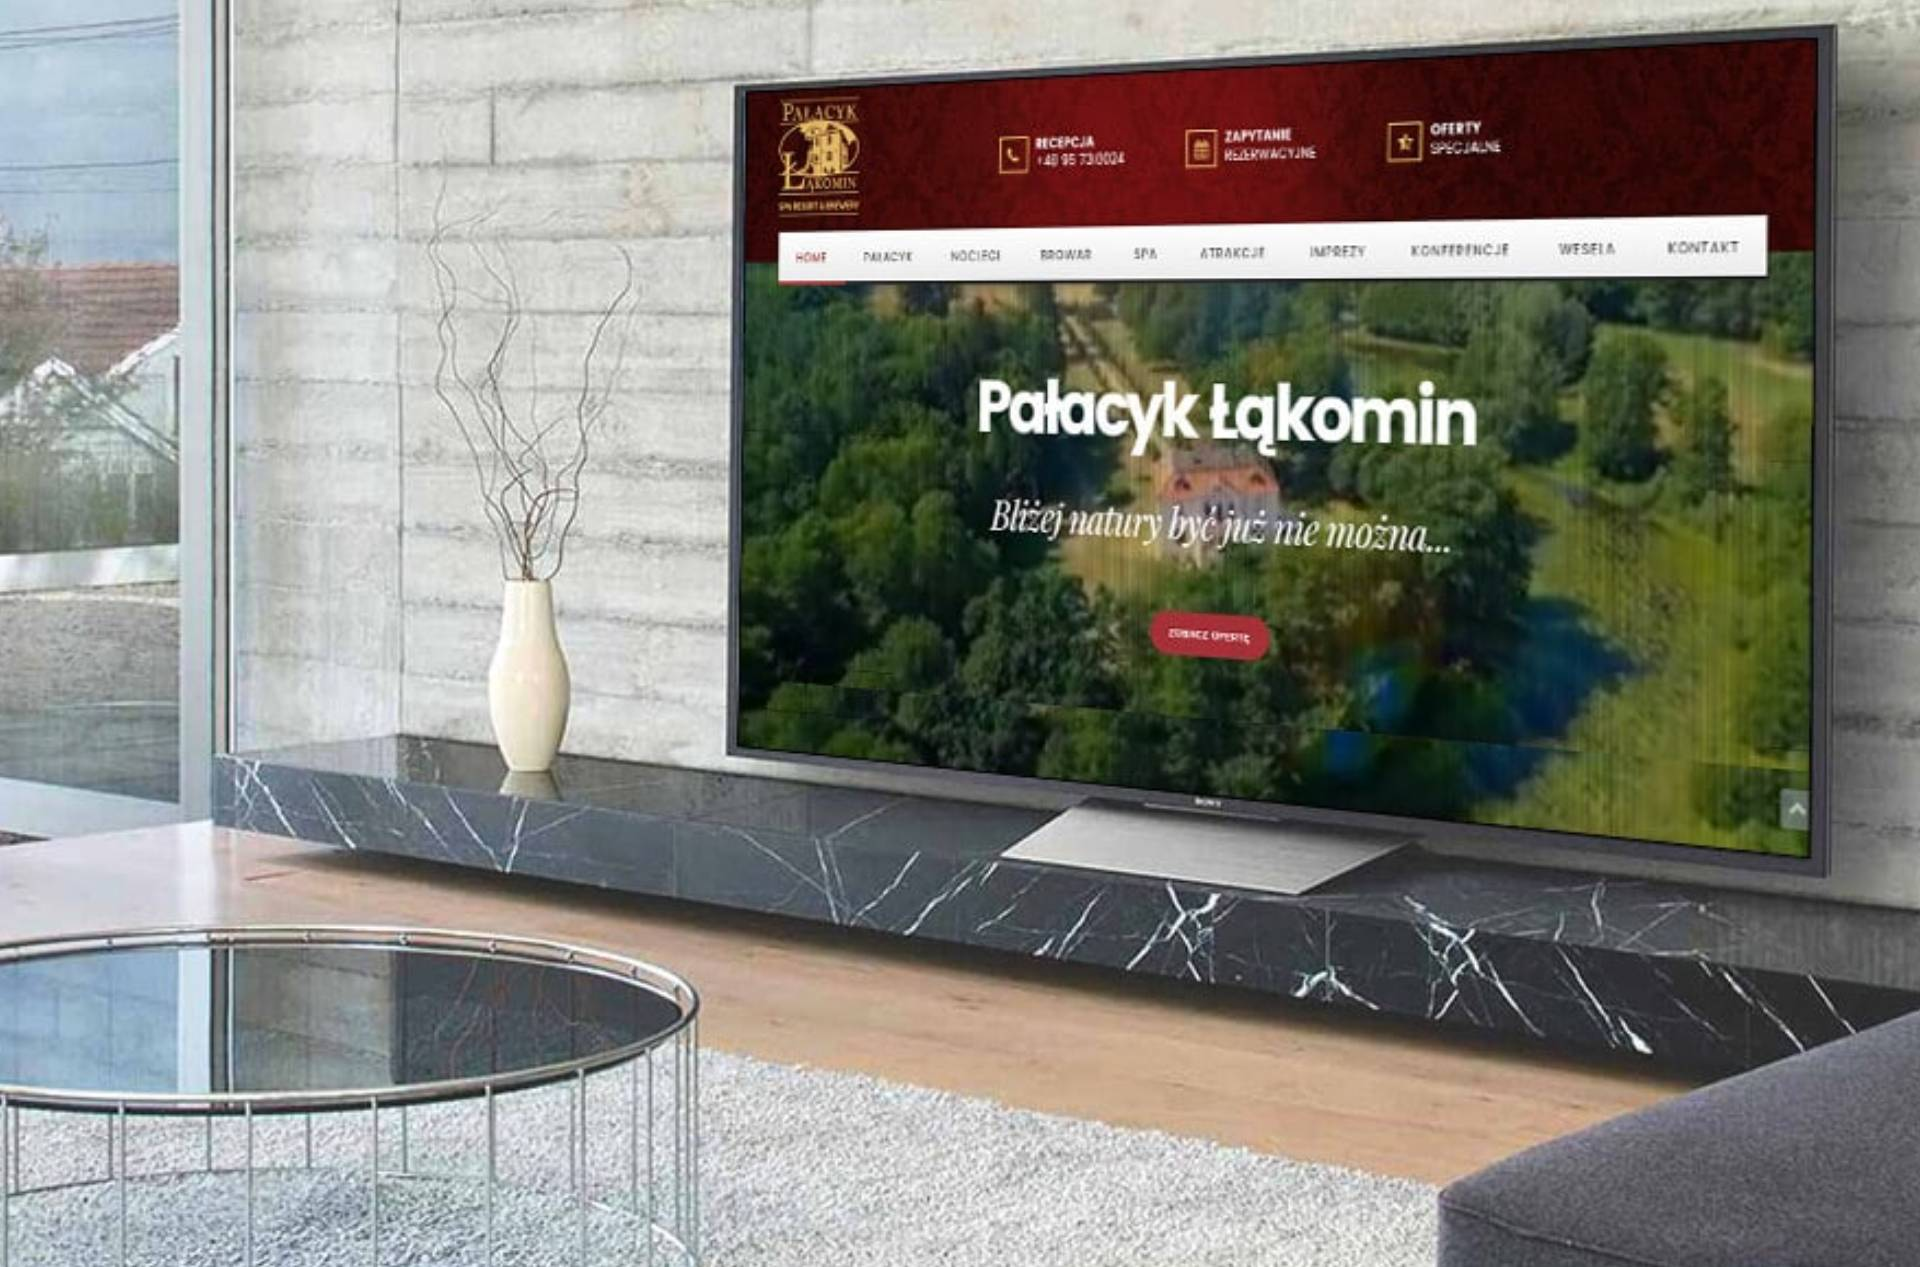 ROAN24 Pałacyk Łąkomin Suíomh Gréasáin